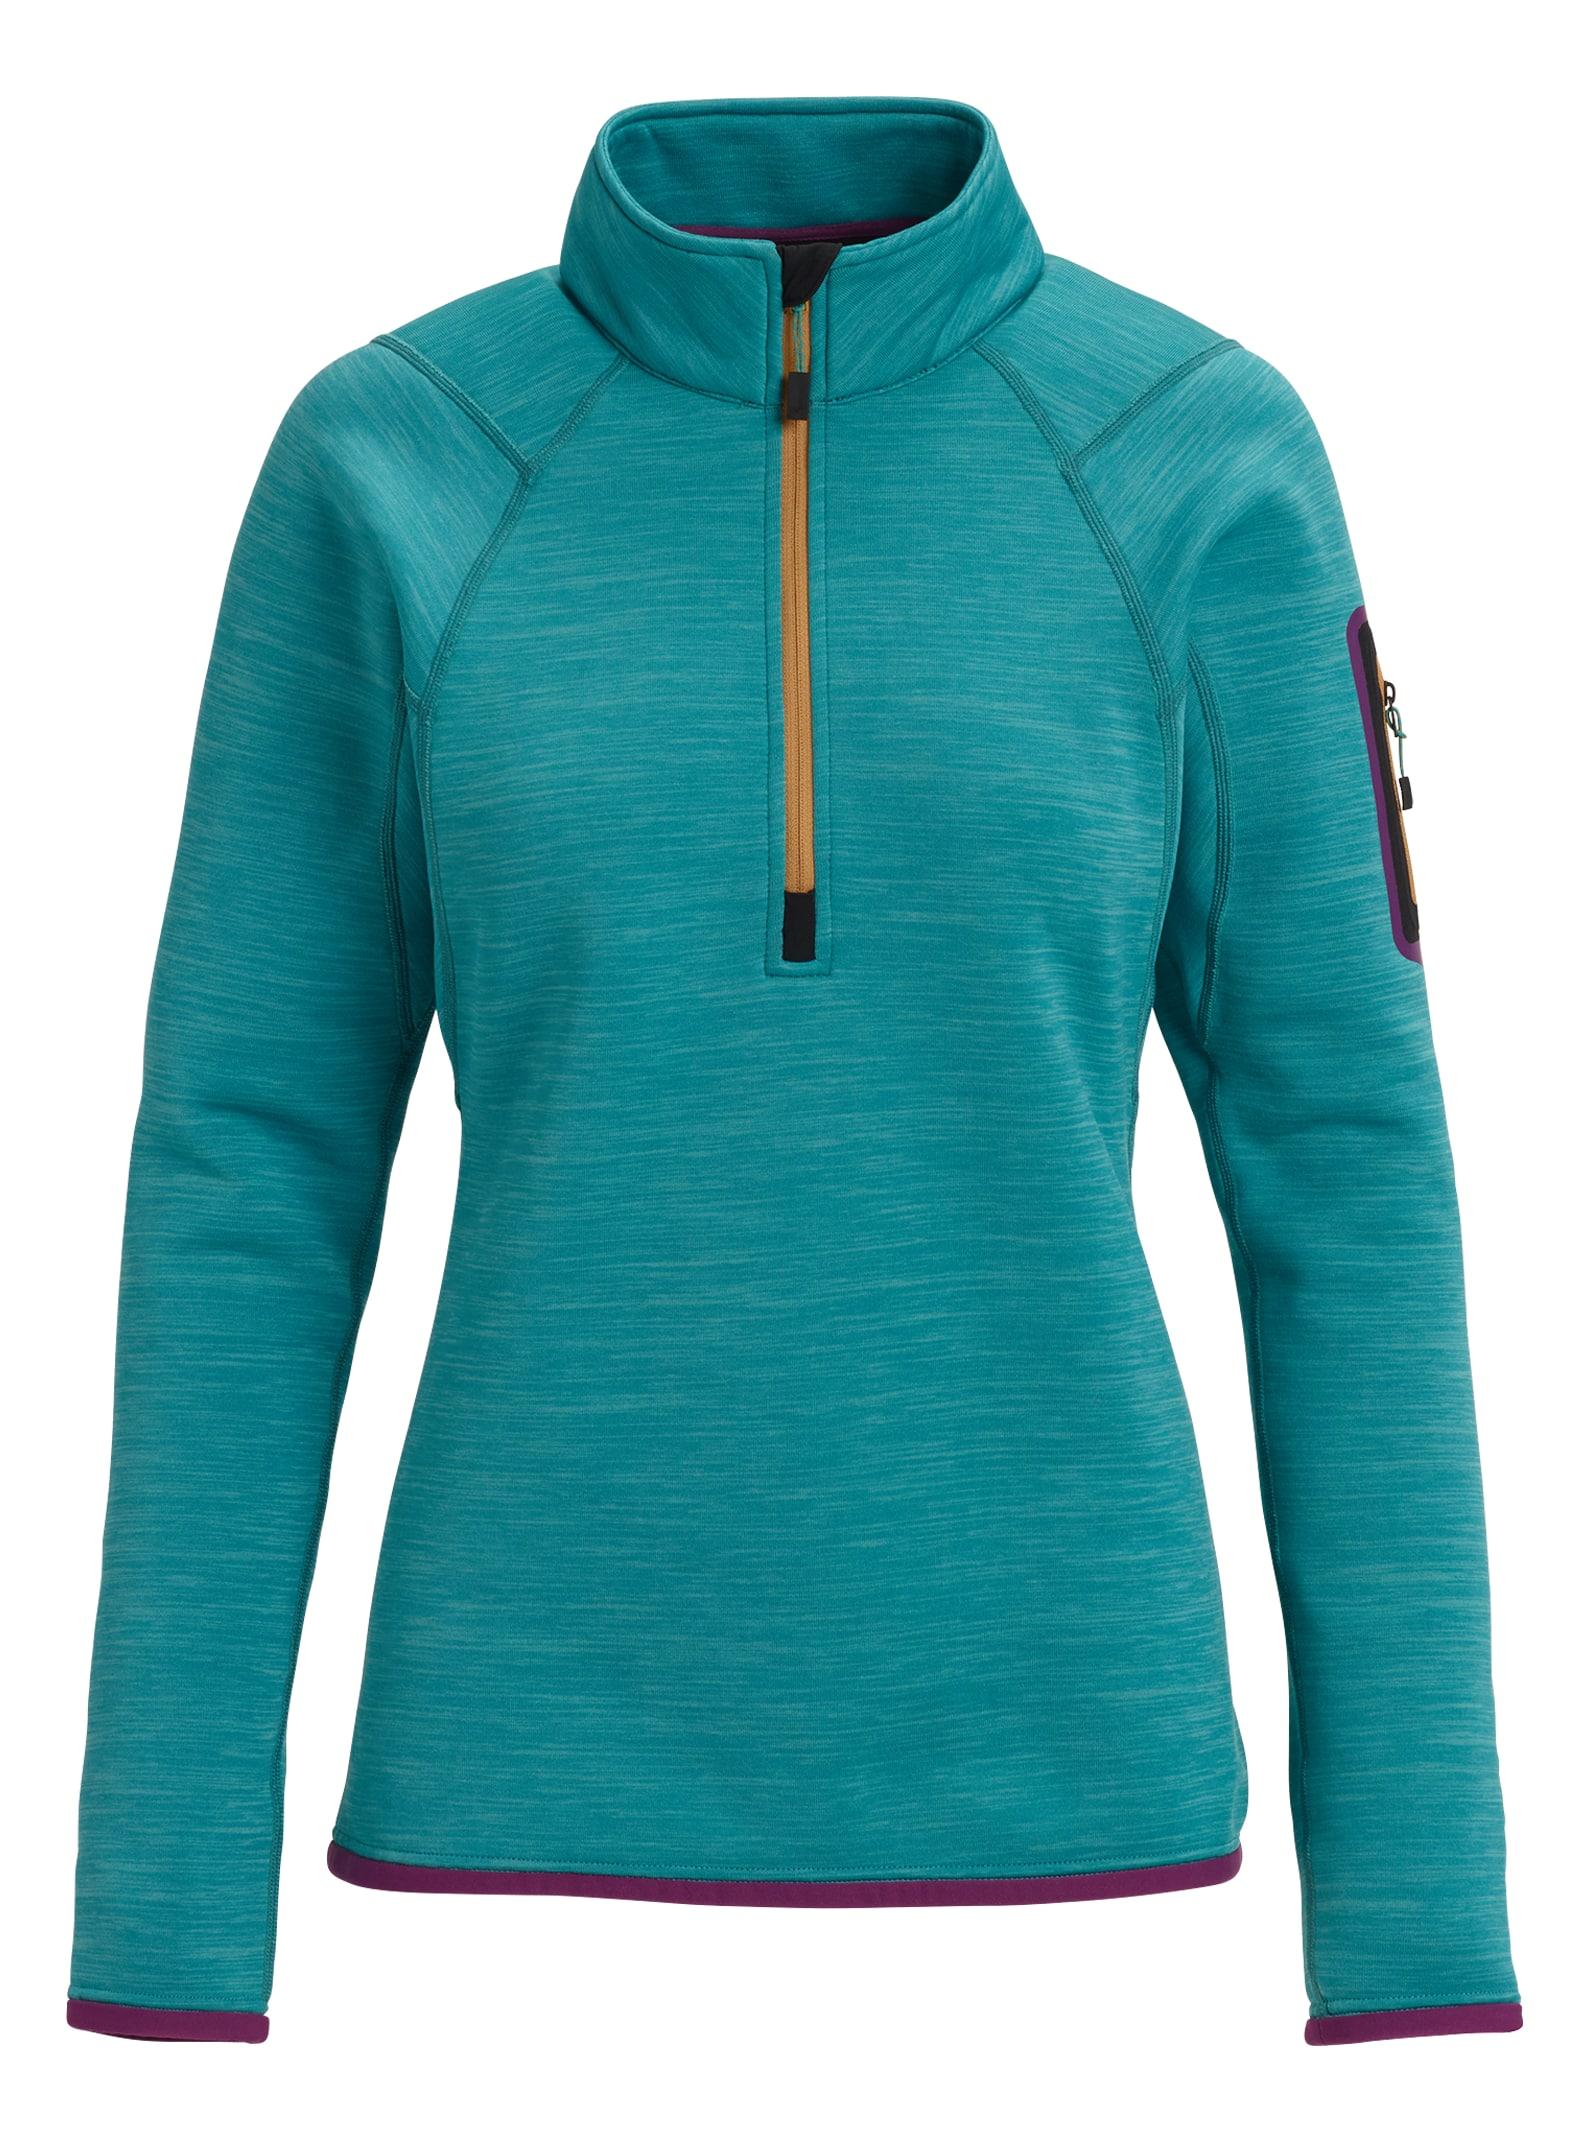 Burton [ak] Turbine fleeceskjorta med dragkedja för damer, Green-Blue Slate Heather, S